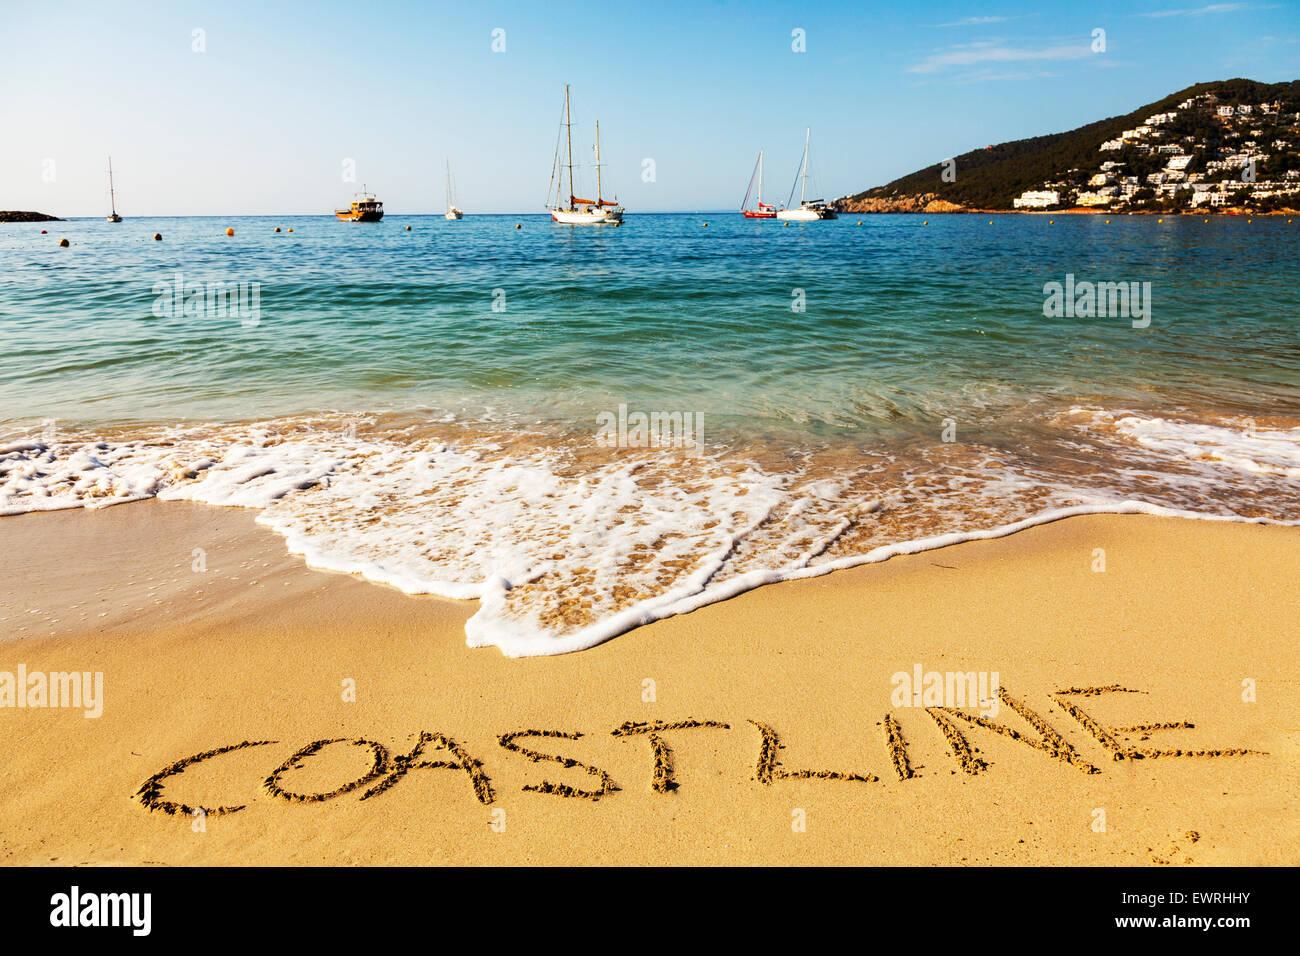 Coastline word in sand written on beach Spanish fun resort seas coast coastlines holidays vacations trips trip getaway - Stock Image